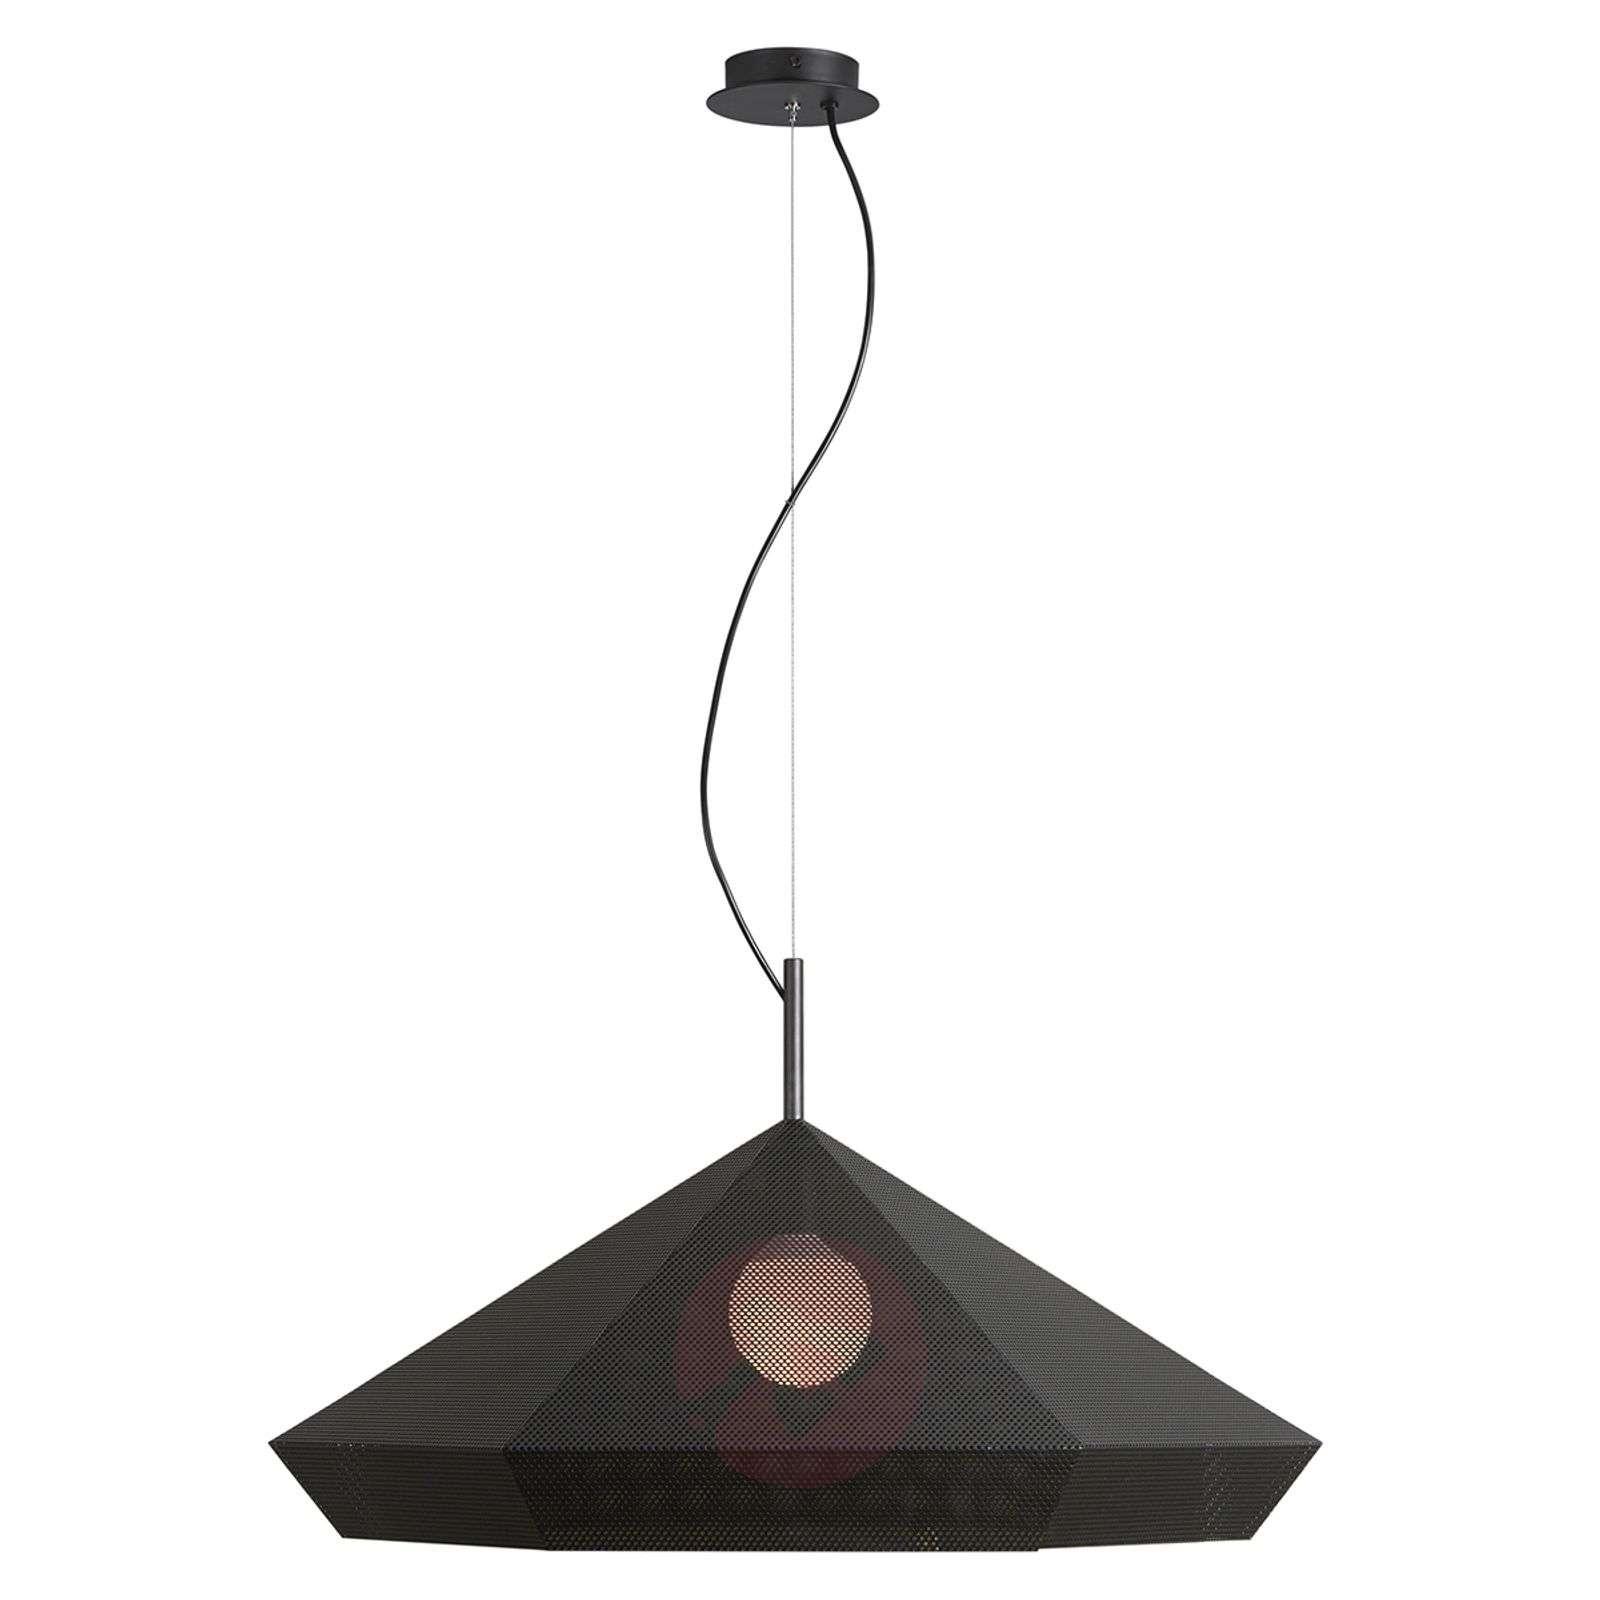 Priamo design-riippuvalaisin, musta, 77 cm-4011739-01